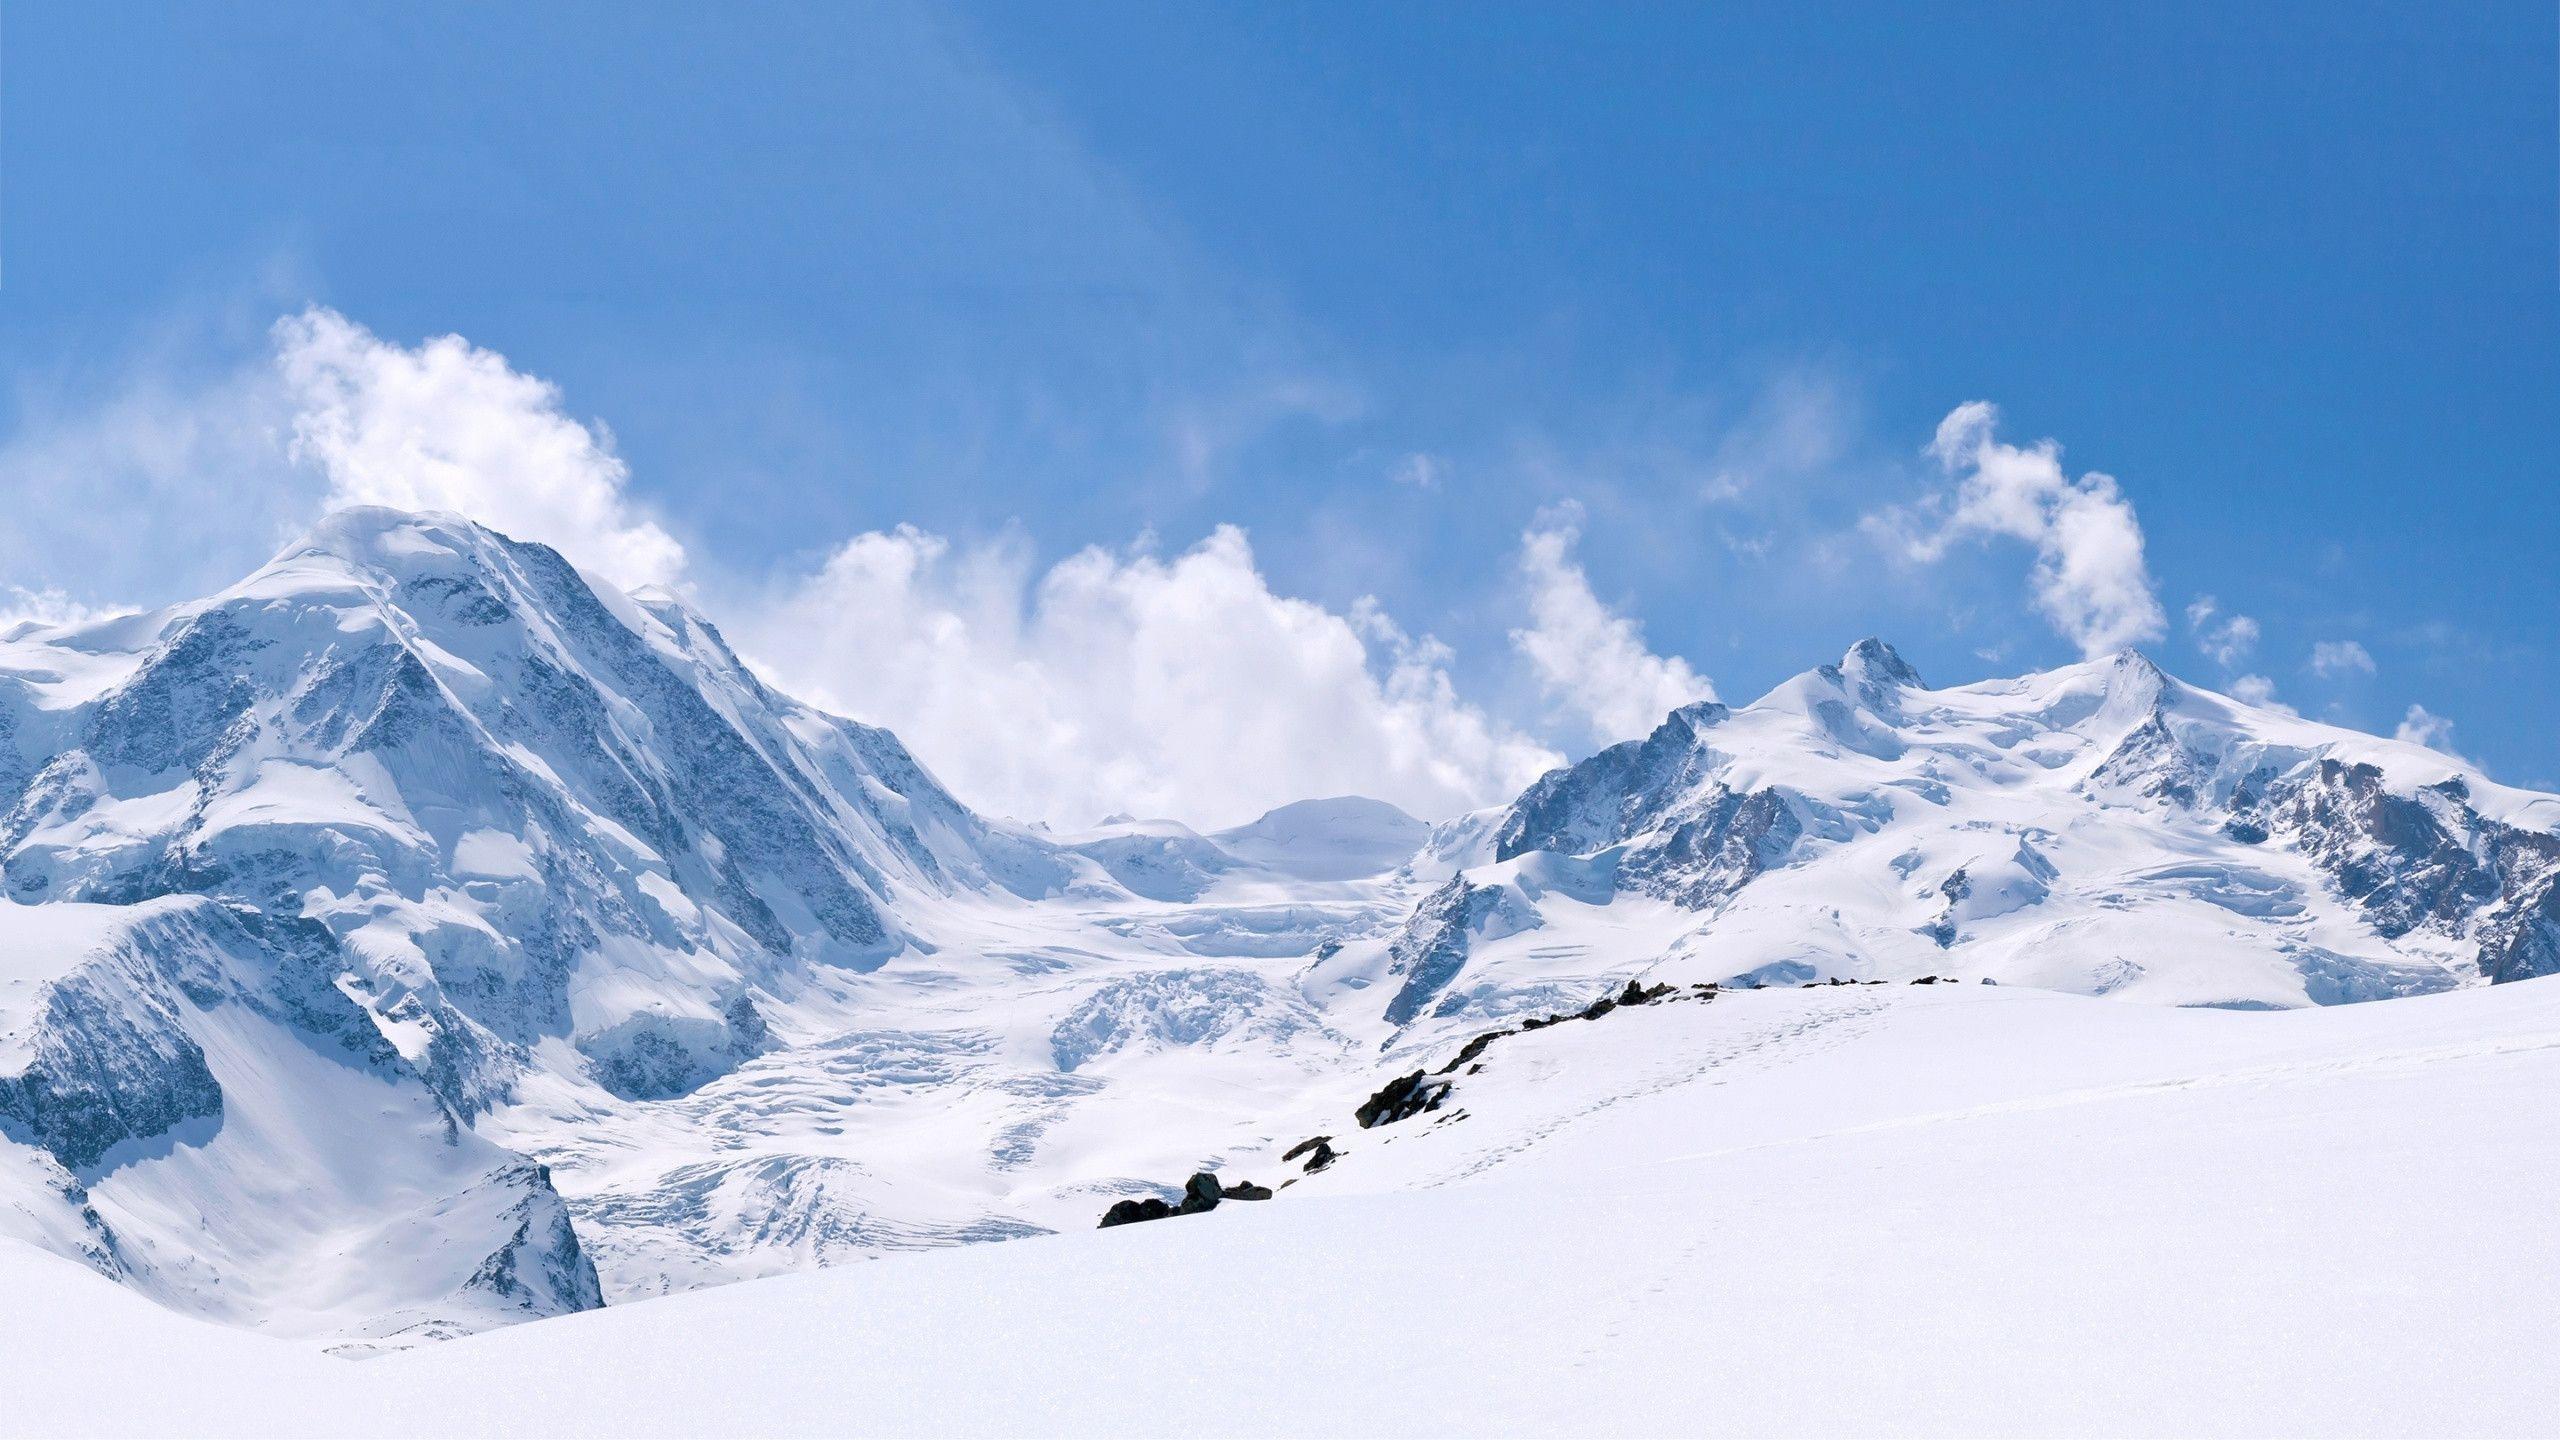 Winter Mountains Hd